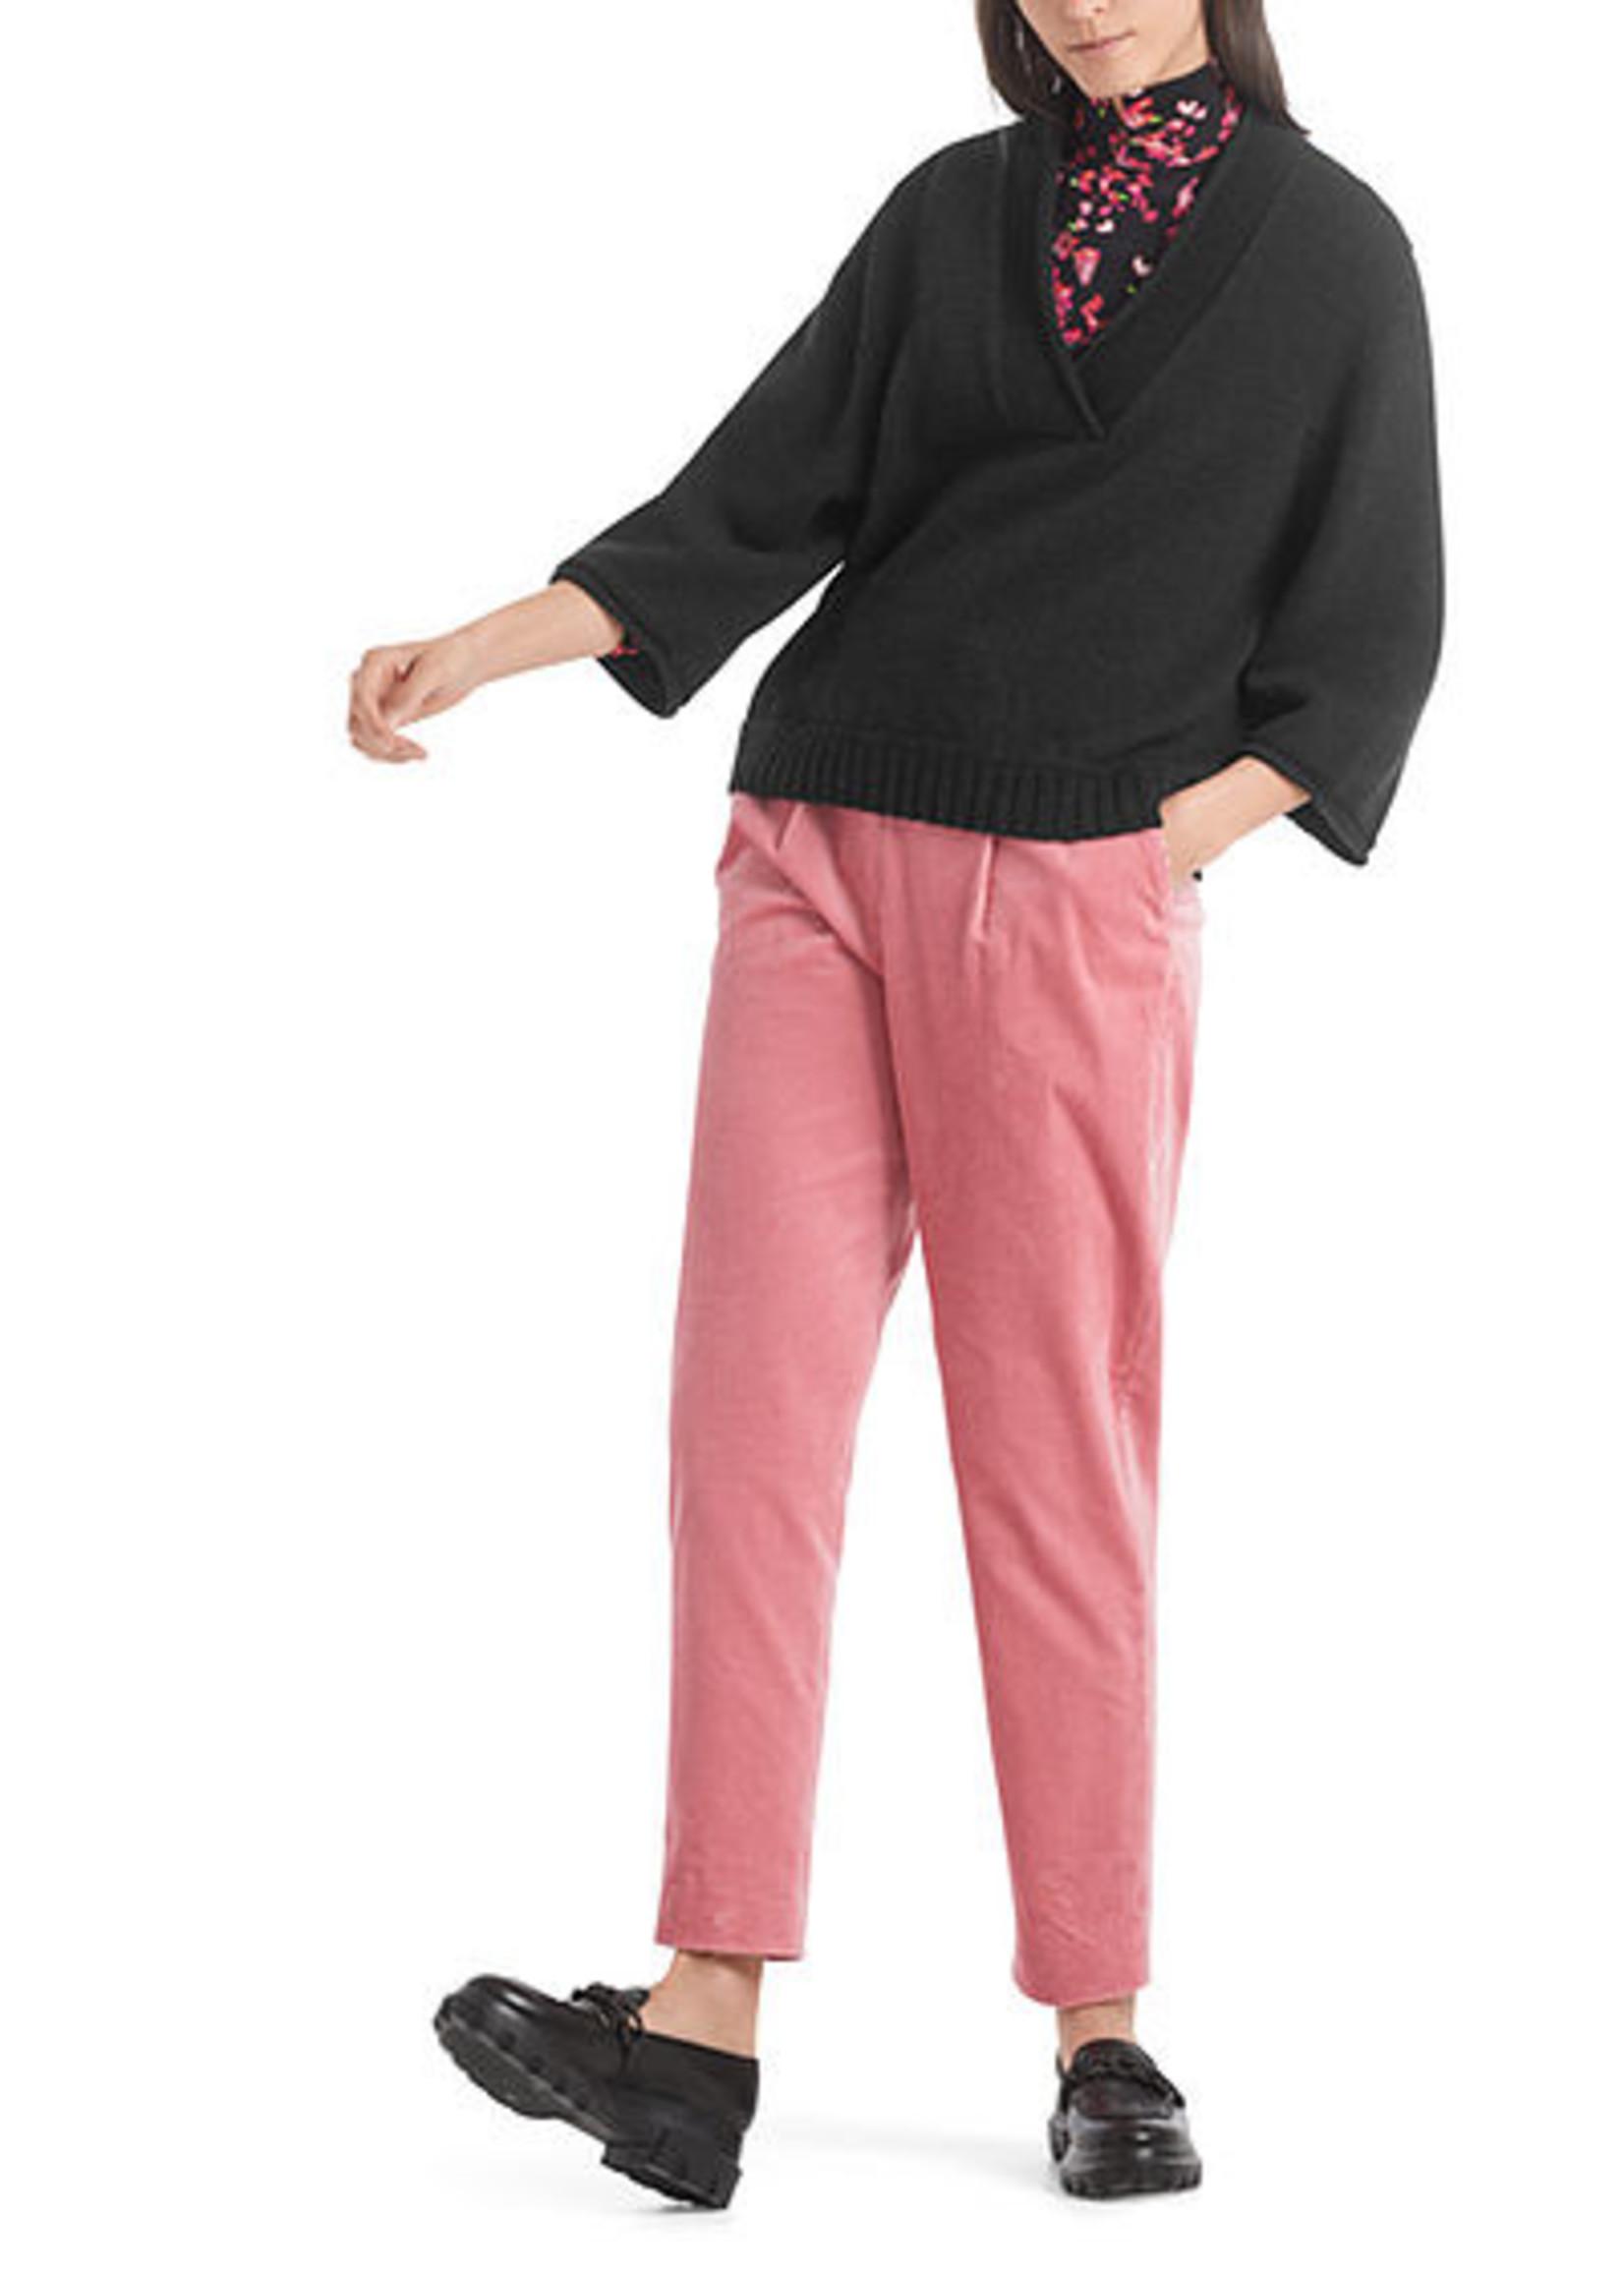 Sweater RC 41.60 M28 slate